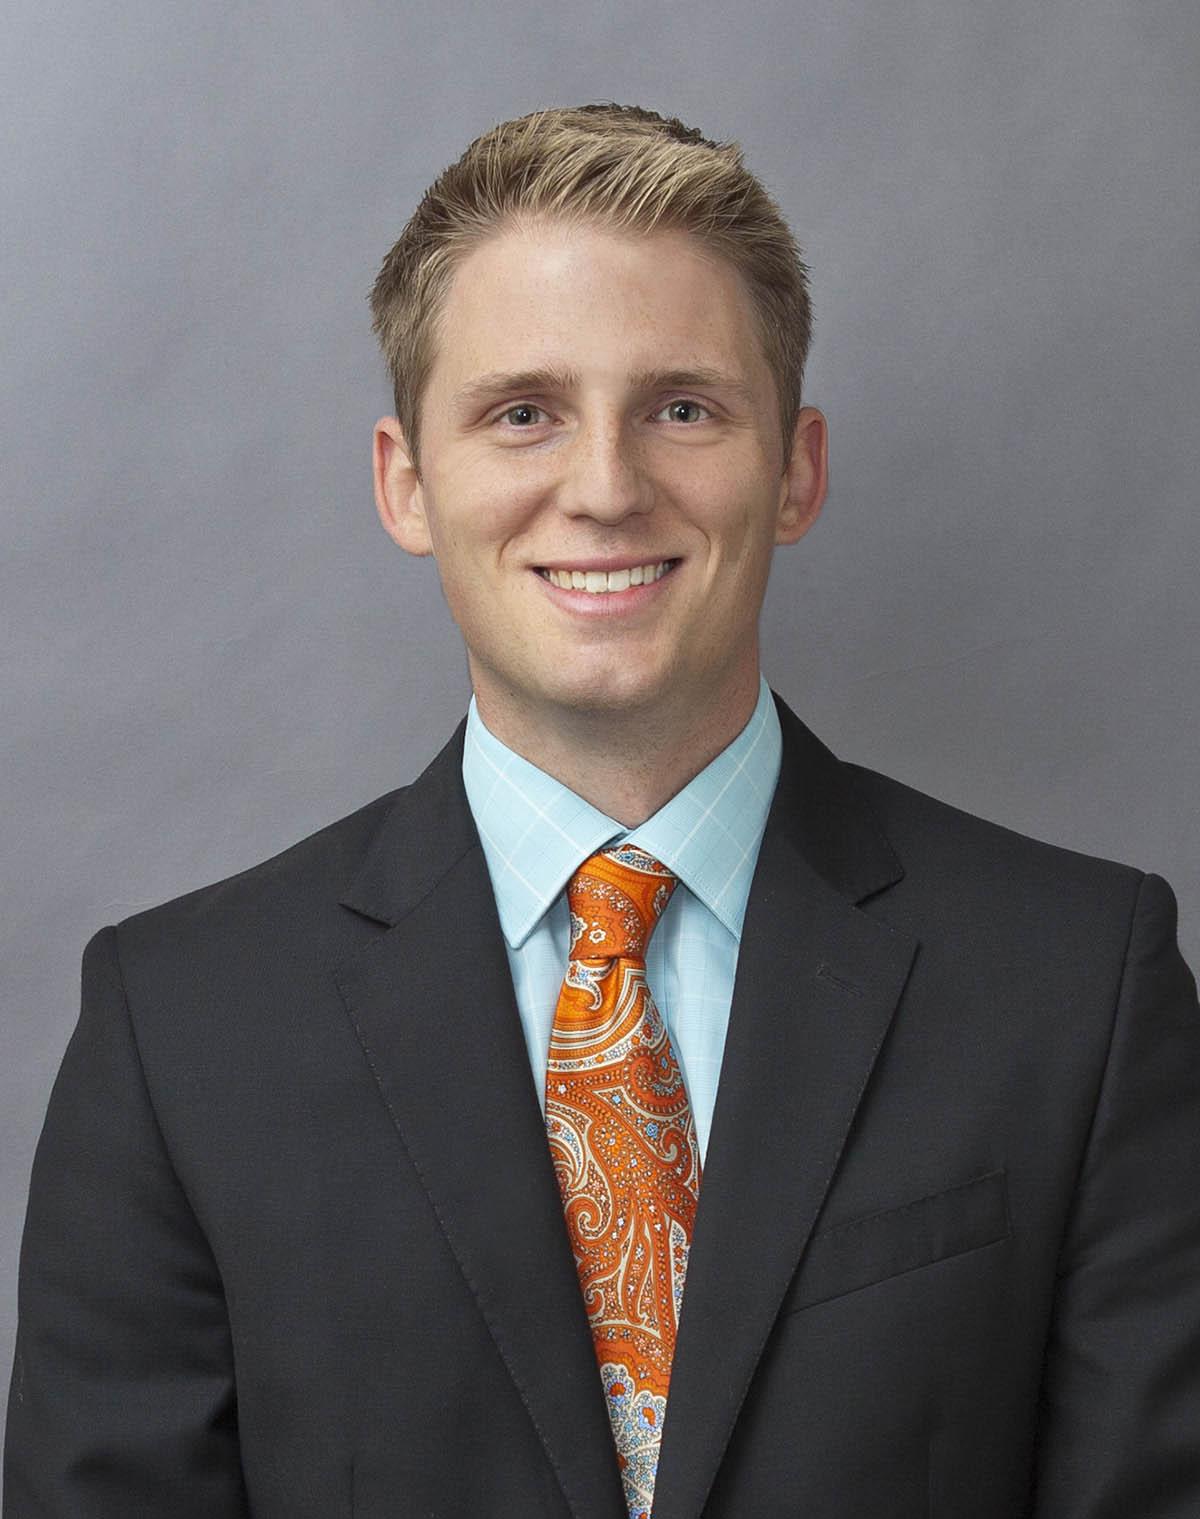 Monona Bank Business Banker Jordan Casto